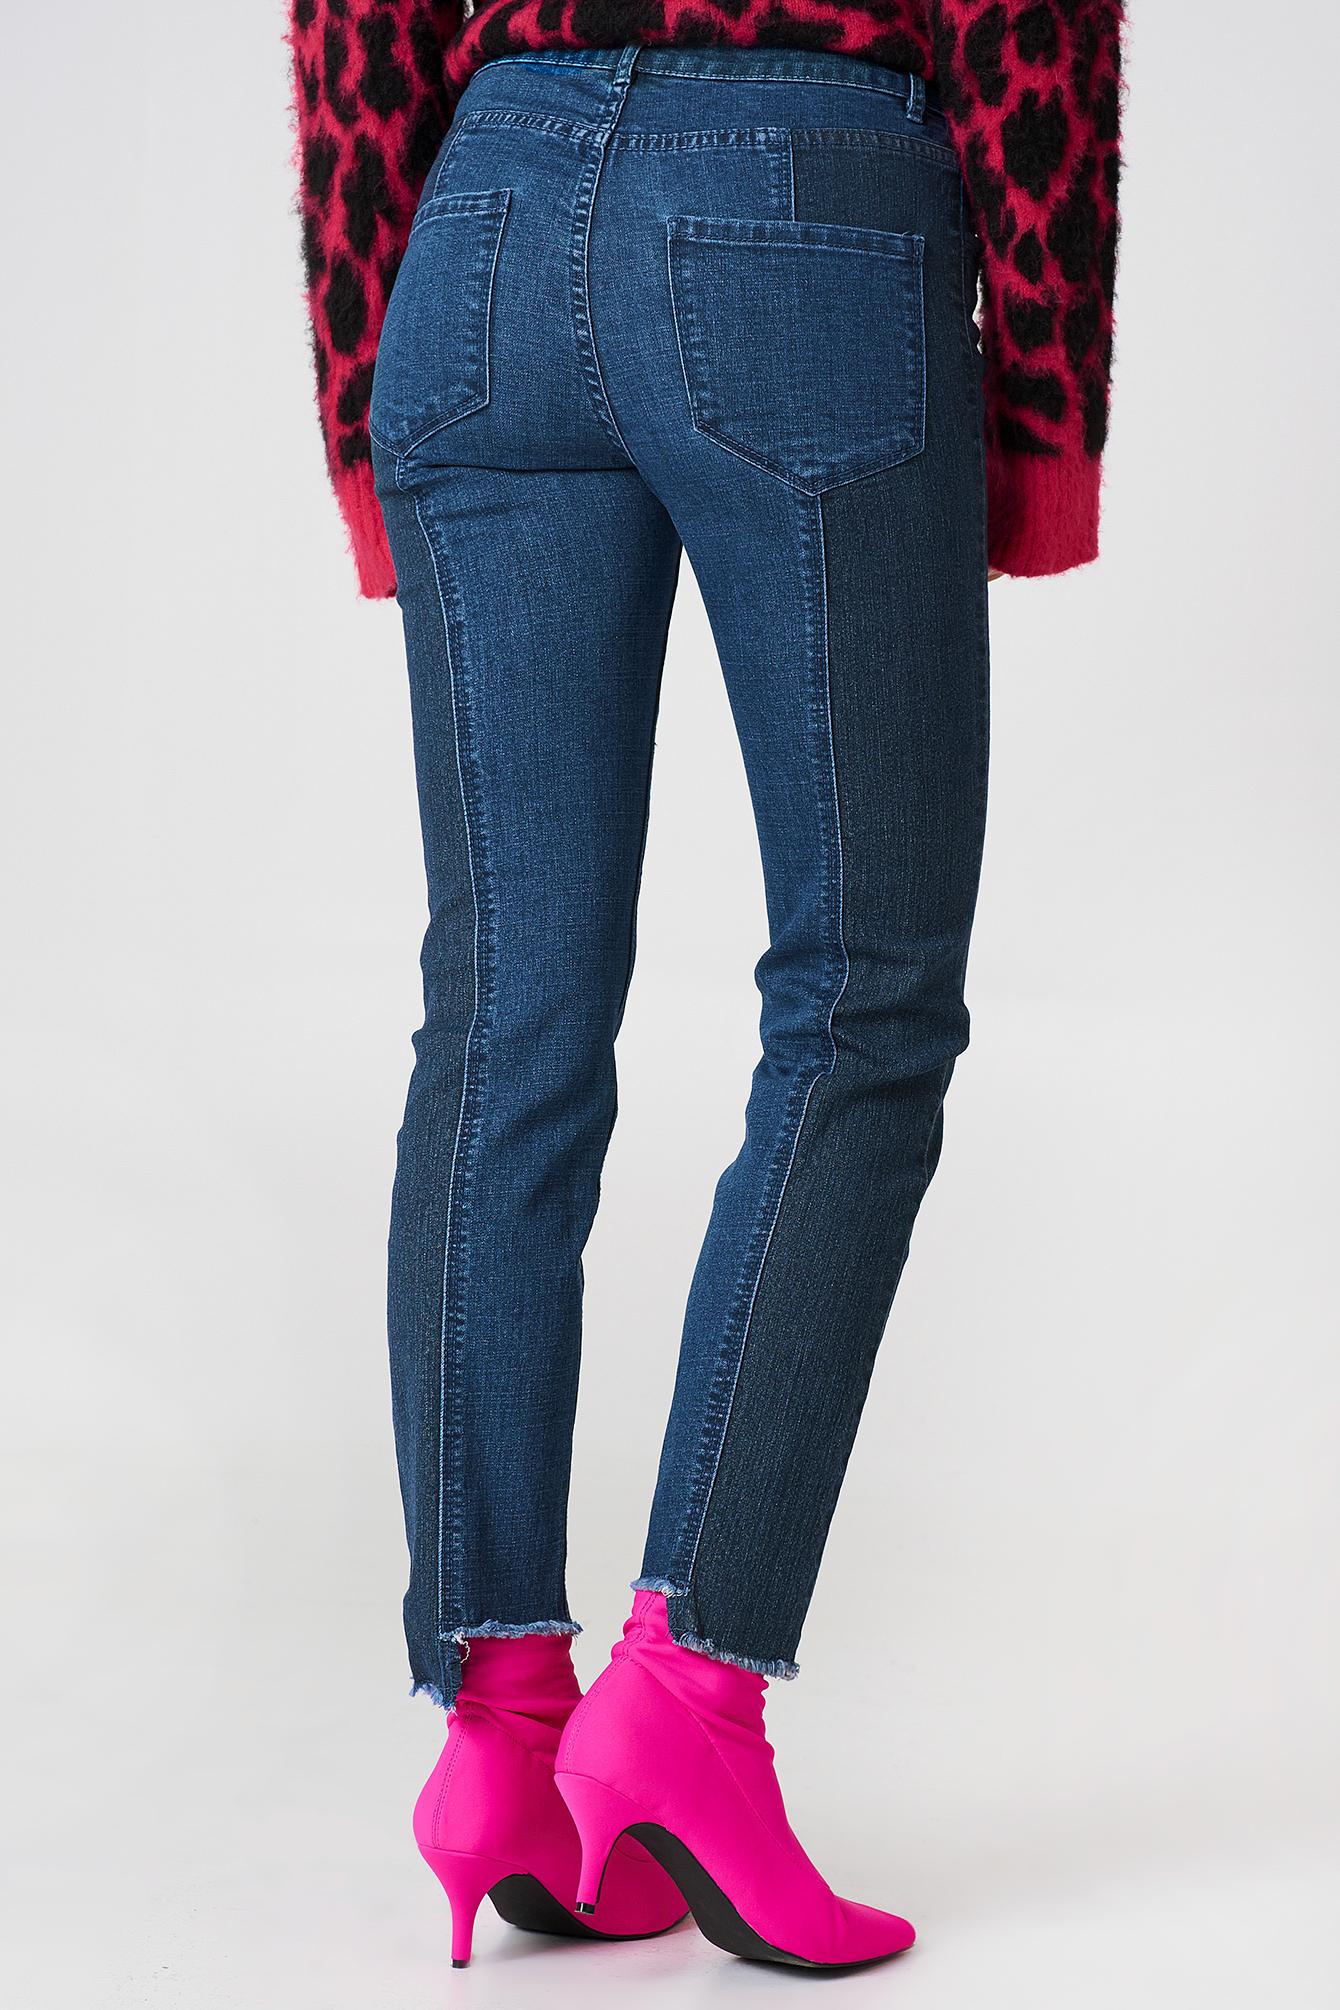 Jeansy w dwóch odcieniach Hanne NA-KD.COM